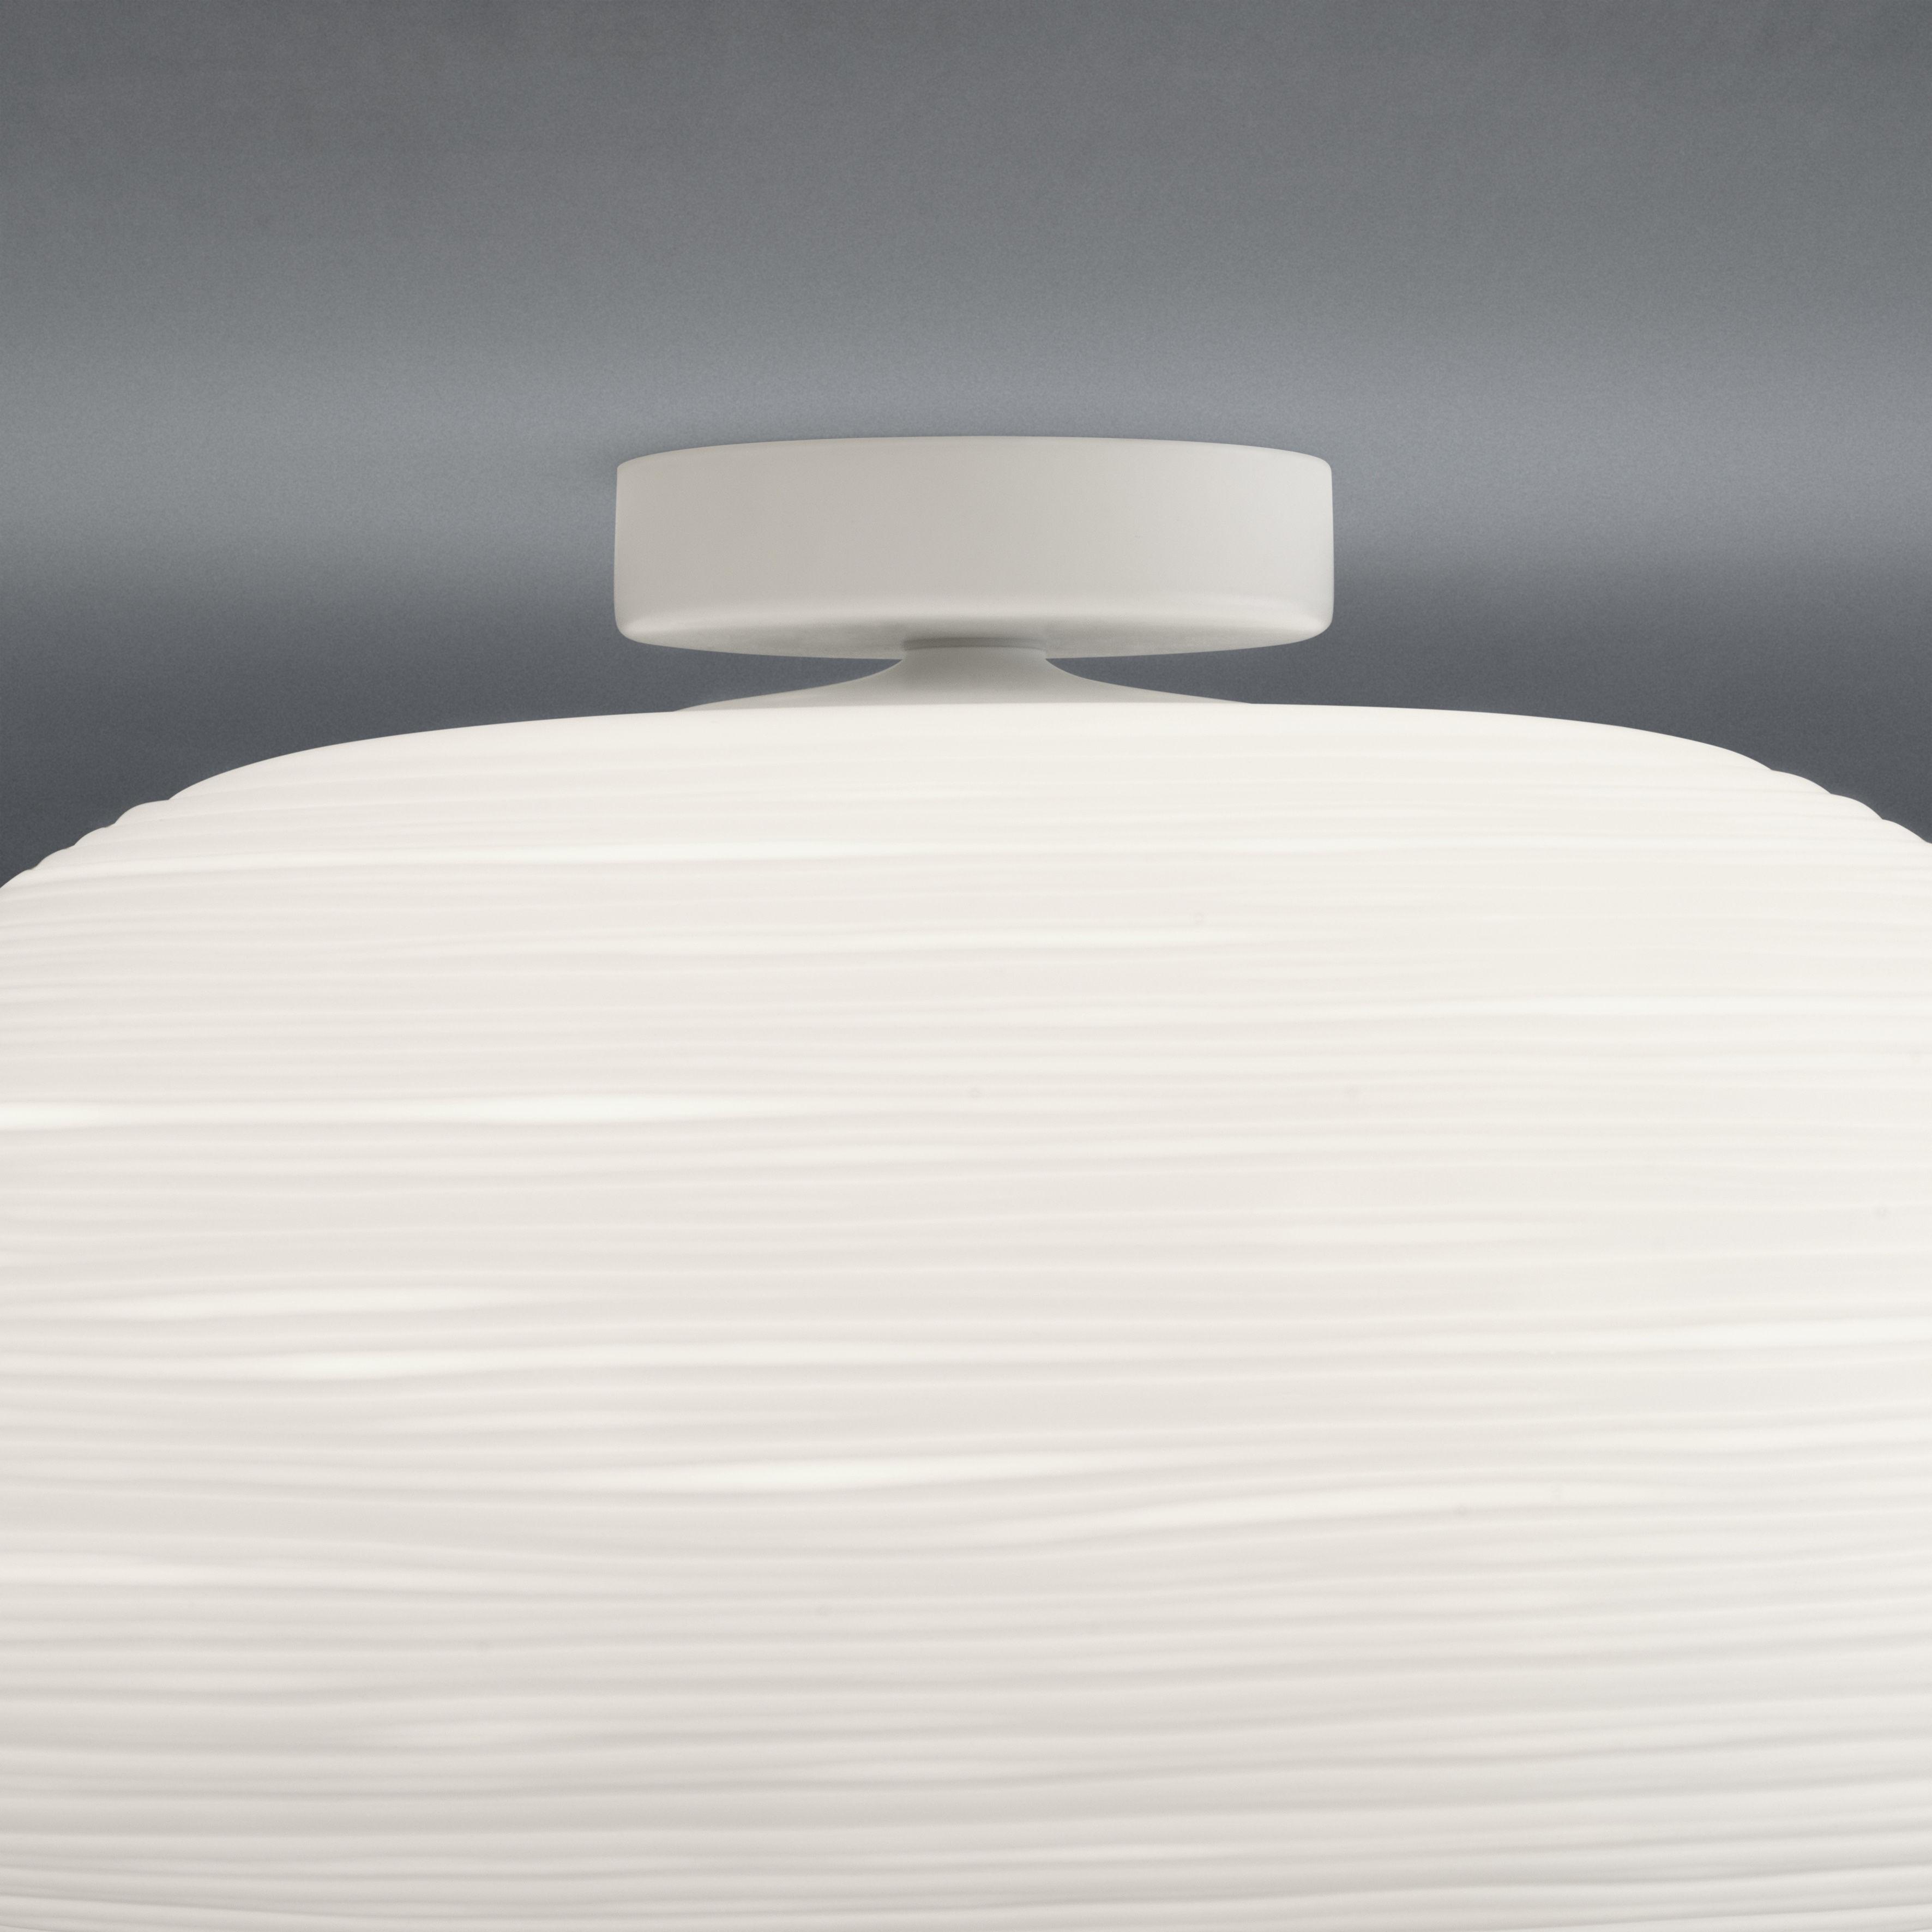 rituals 1 24 cm x h 37 cm foscarini deckenleuchte. Black Bedroom Furniture Sets. Home Design Ideas